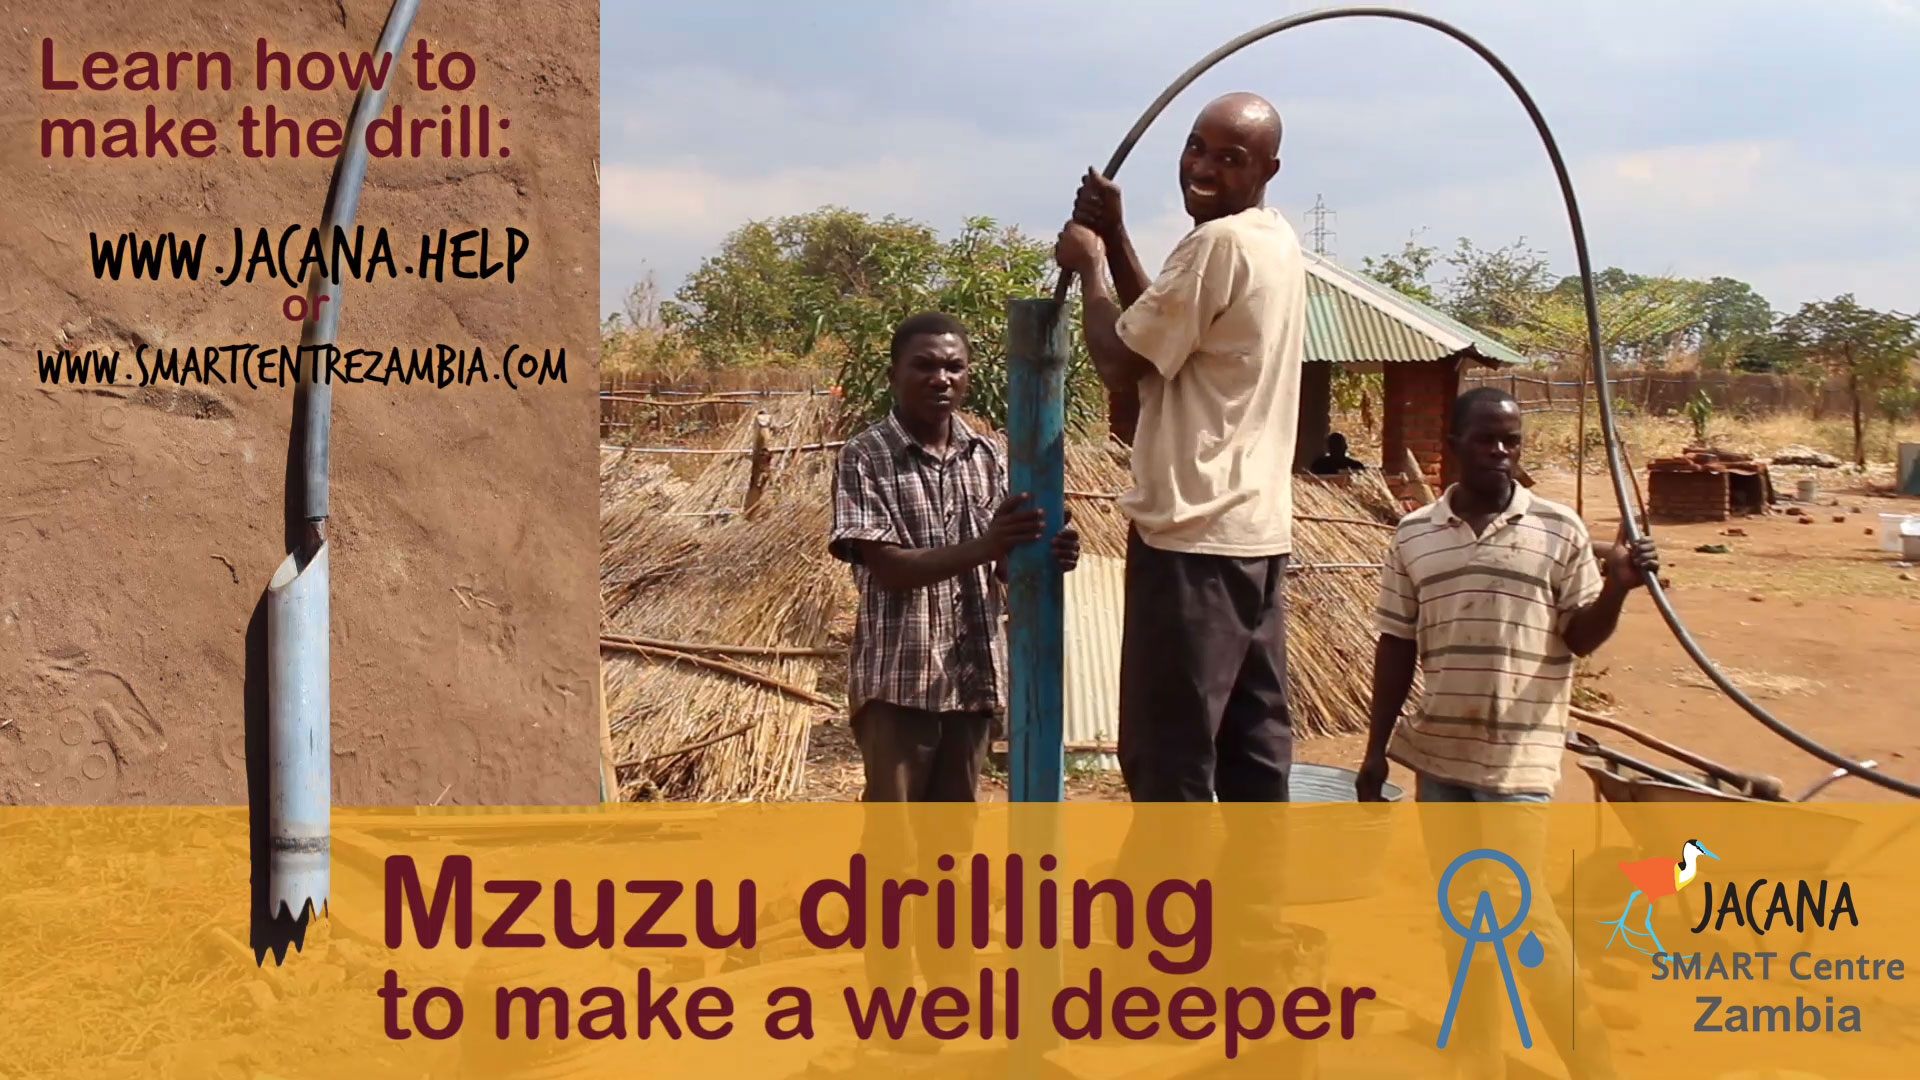 Muzuz drilling, making a well deeper